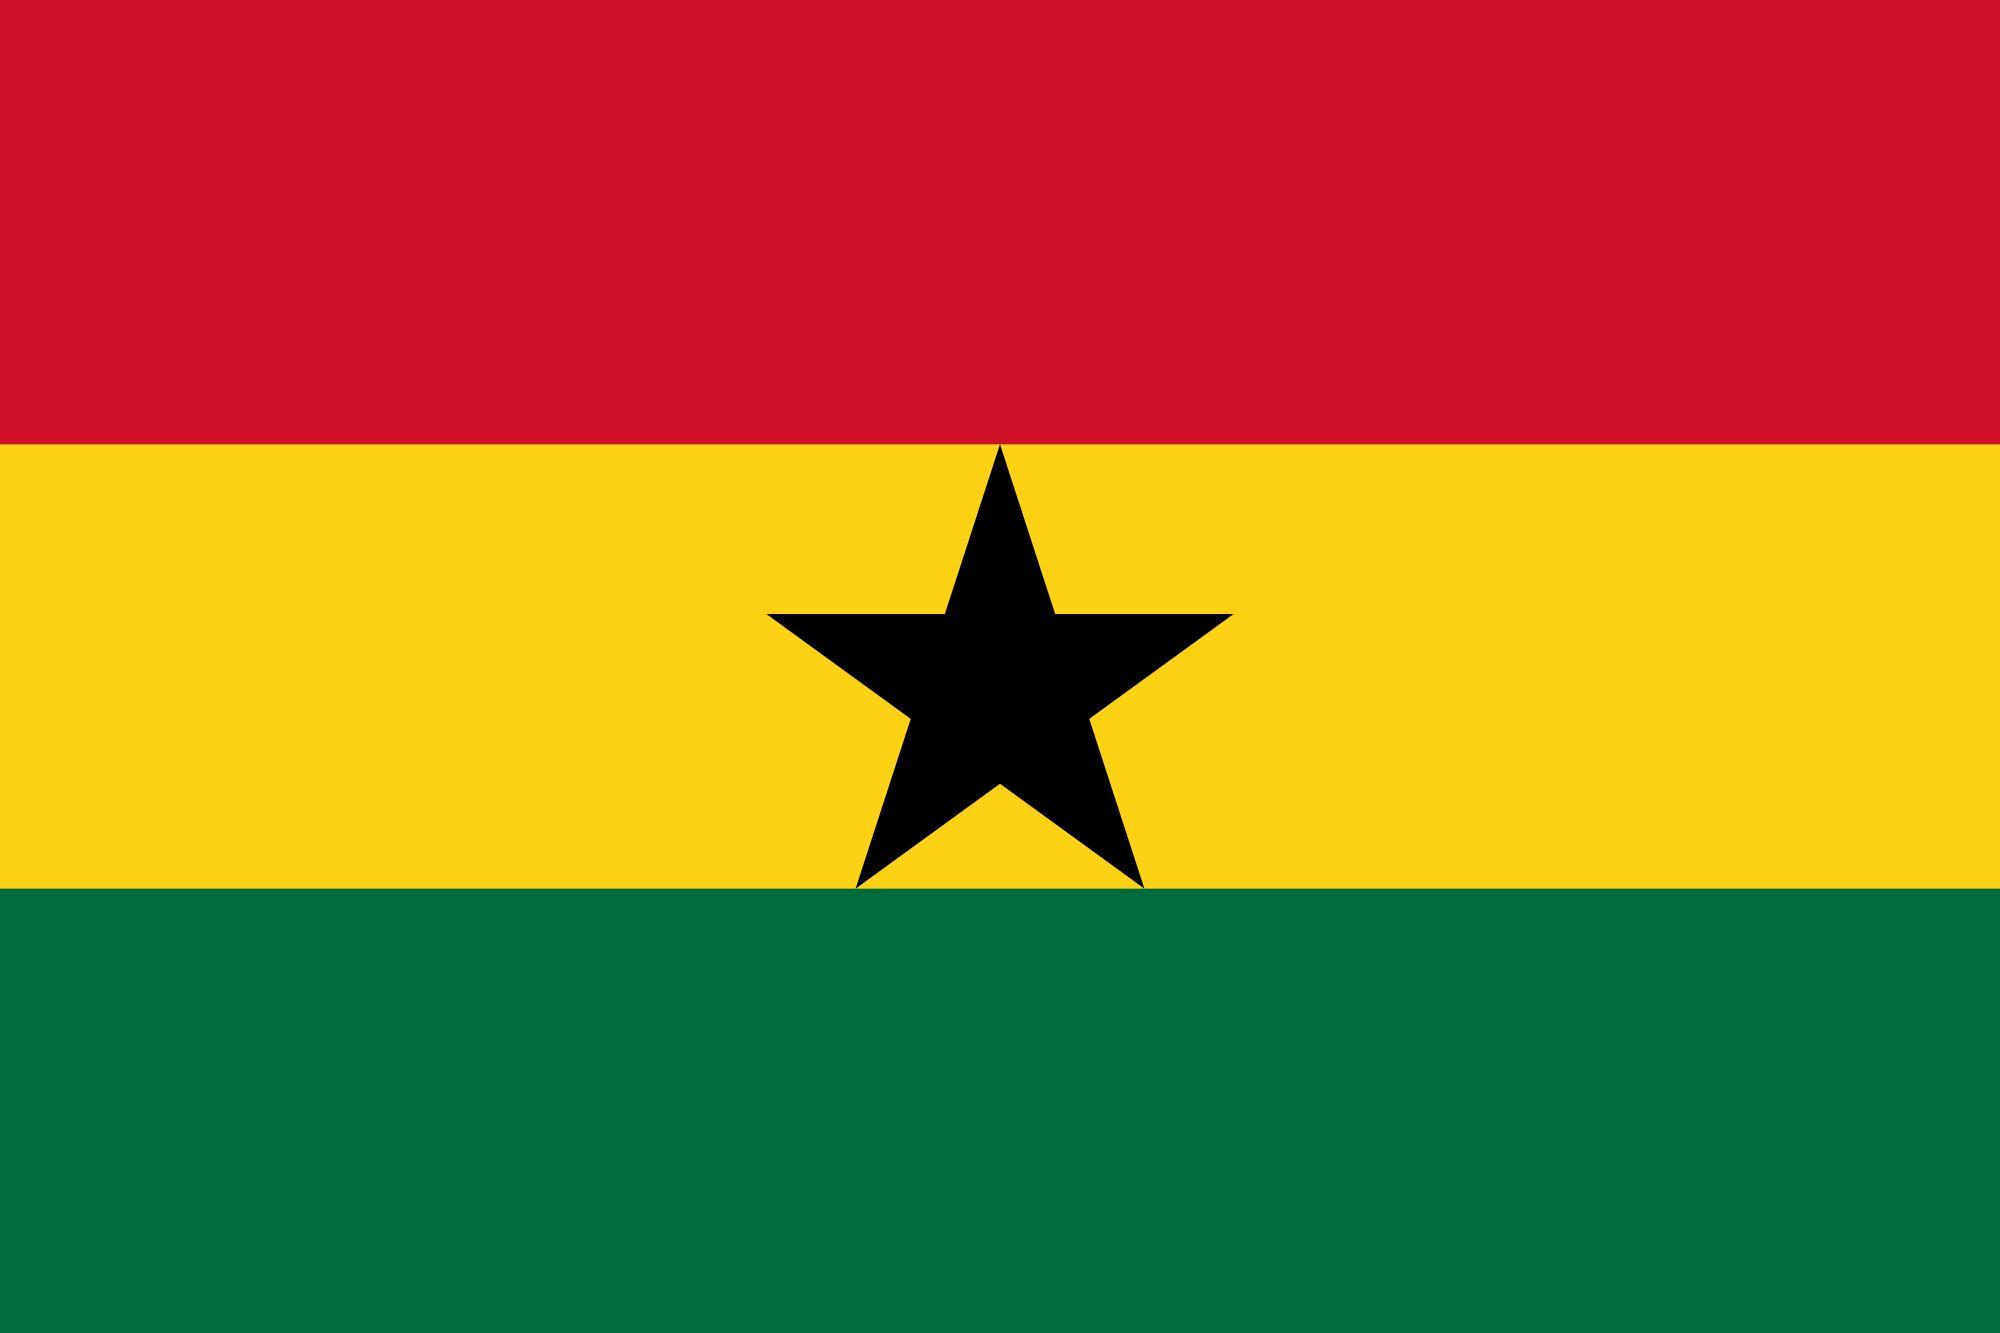 Drapeau Ghana - Le drapeau ghanéen